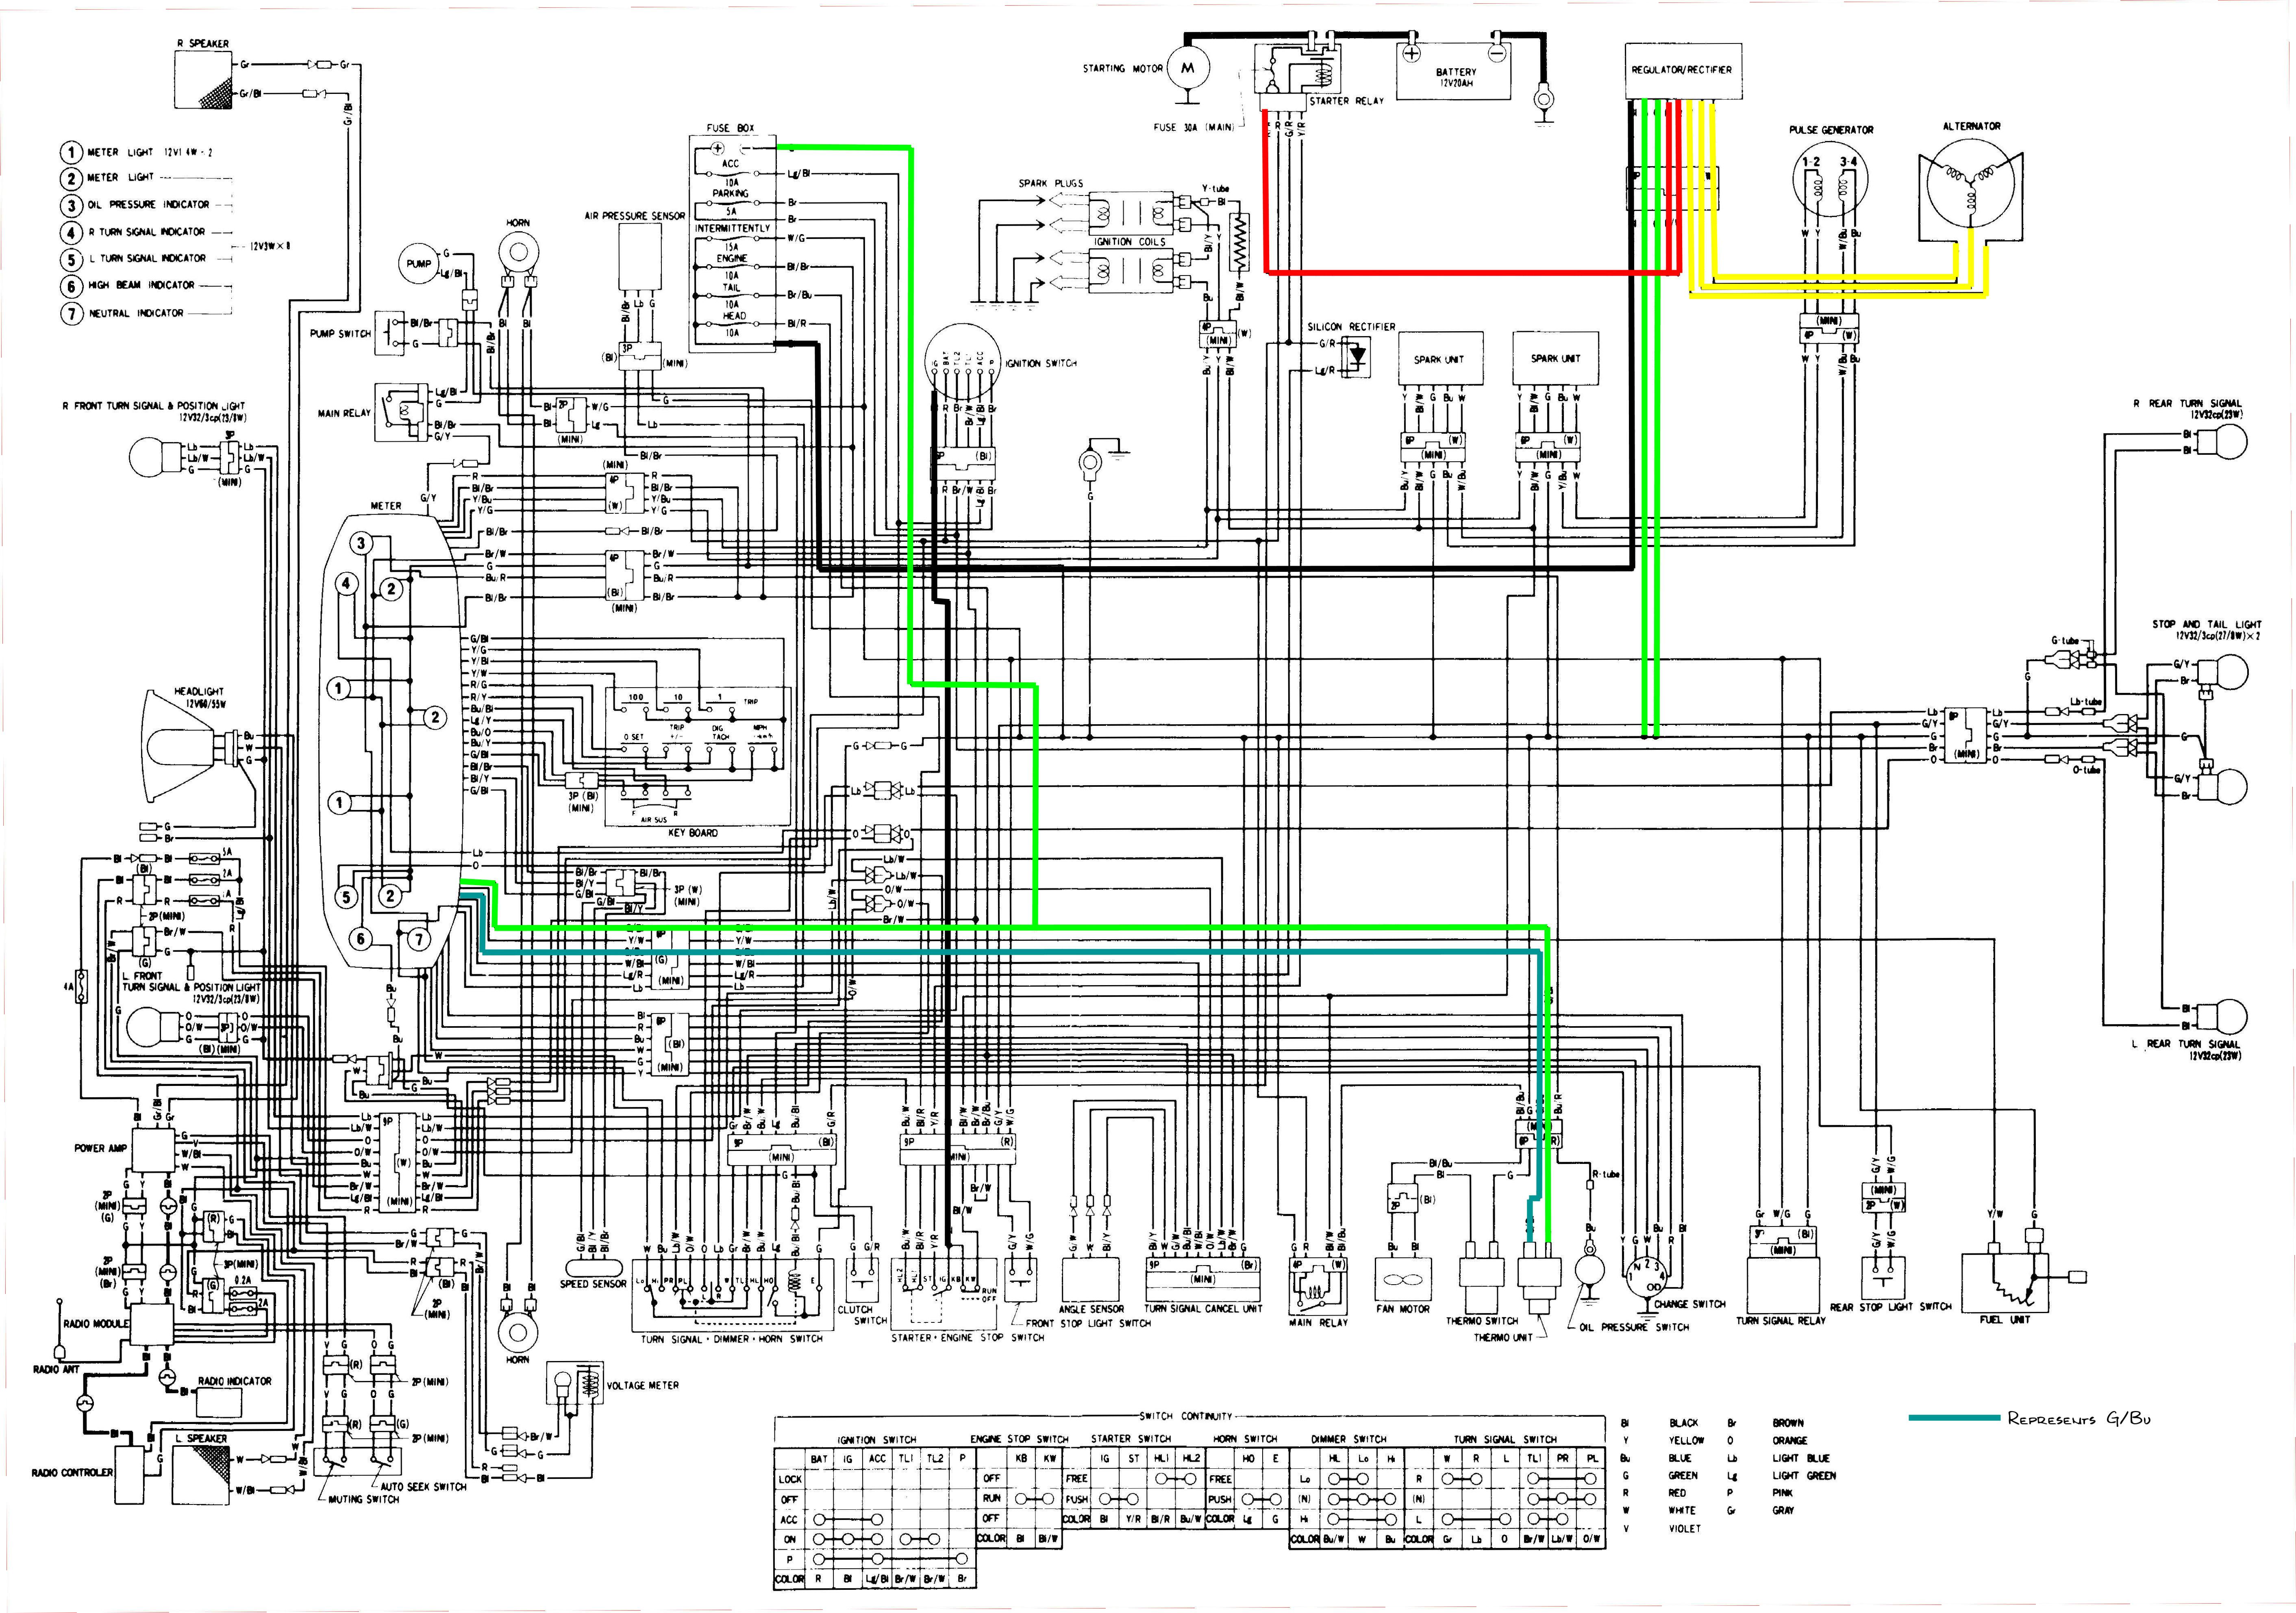 2012 scion xb fuse box diagram